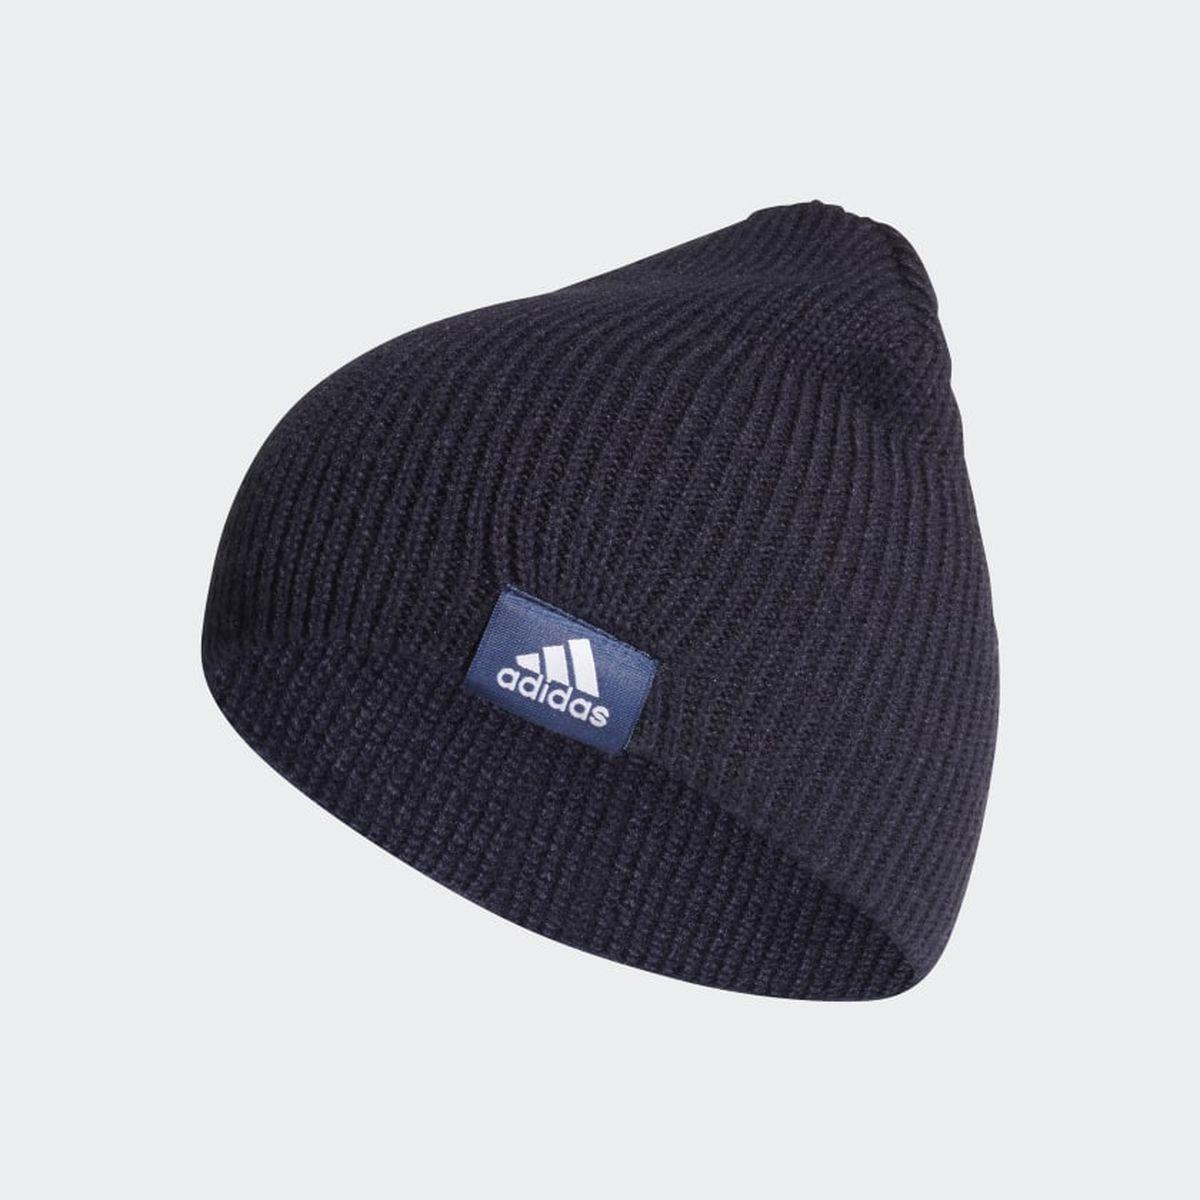 Фото - Шапка adidas Perf Beanie шапка adidas perf beanie цвет синий dj1055 размер 56 57